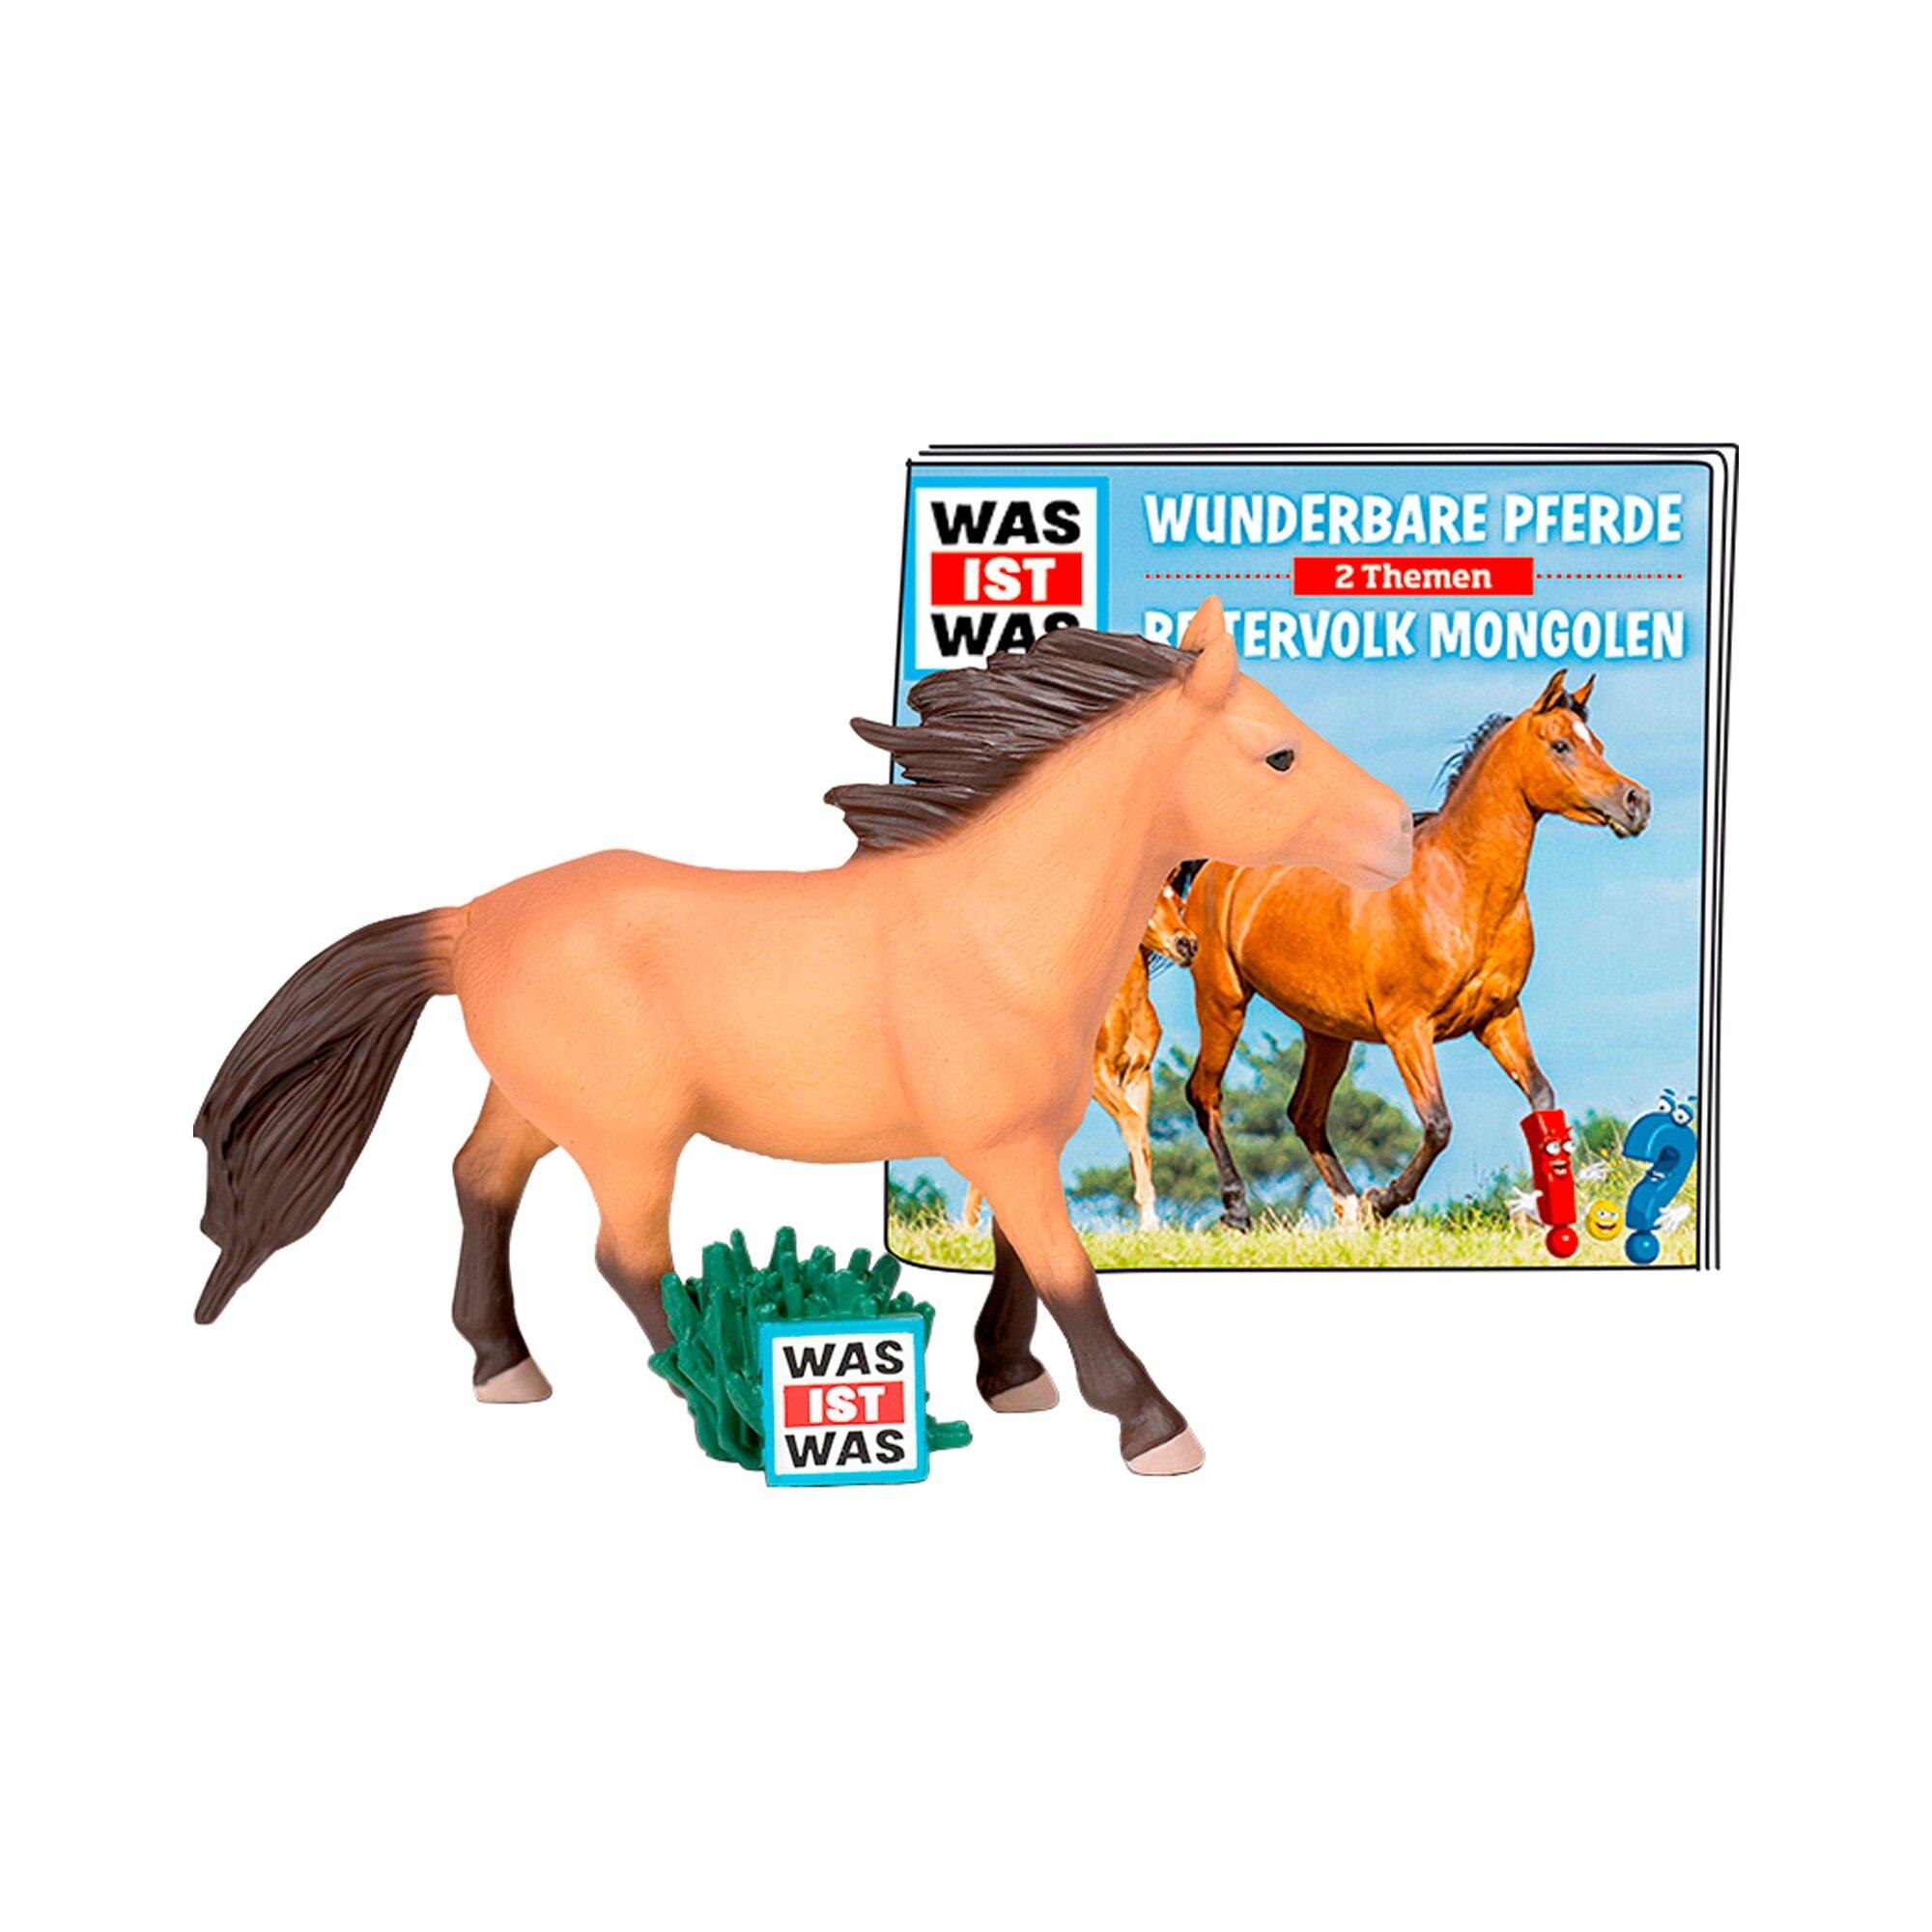 Tonies Tonie Hörfigur WAS IST WAS - Wunderbare Pferde/Reitervolk Mongolen